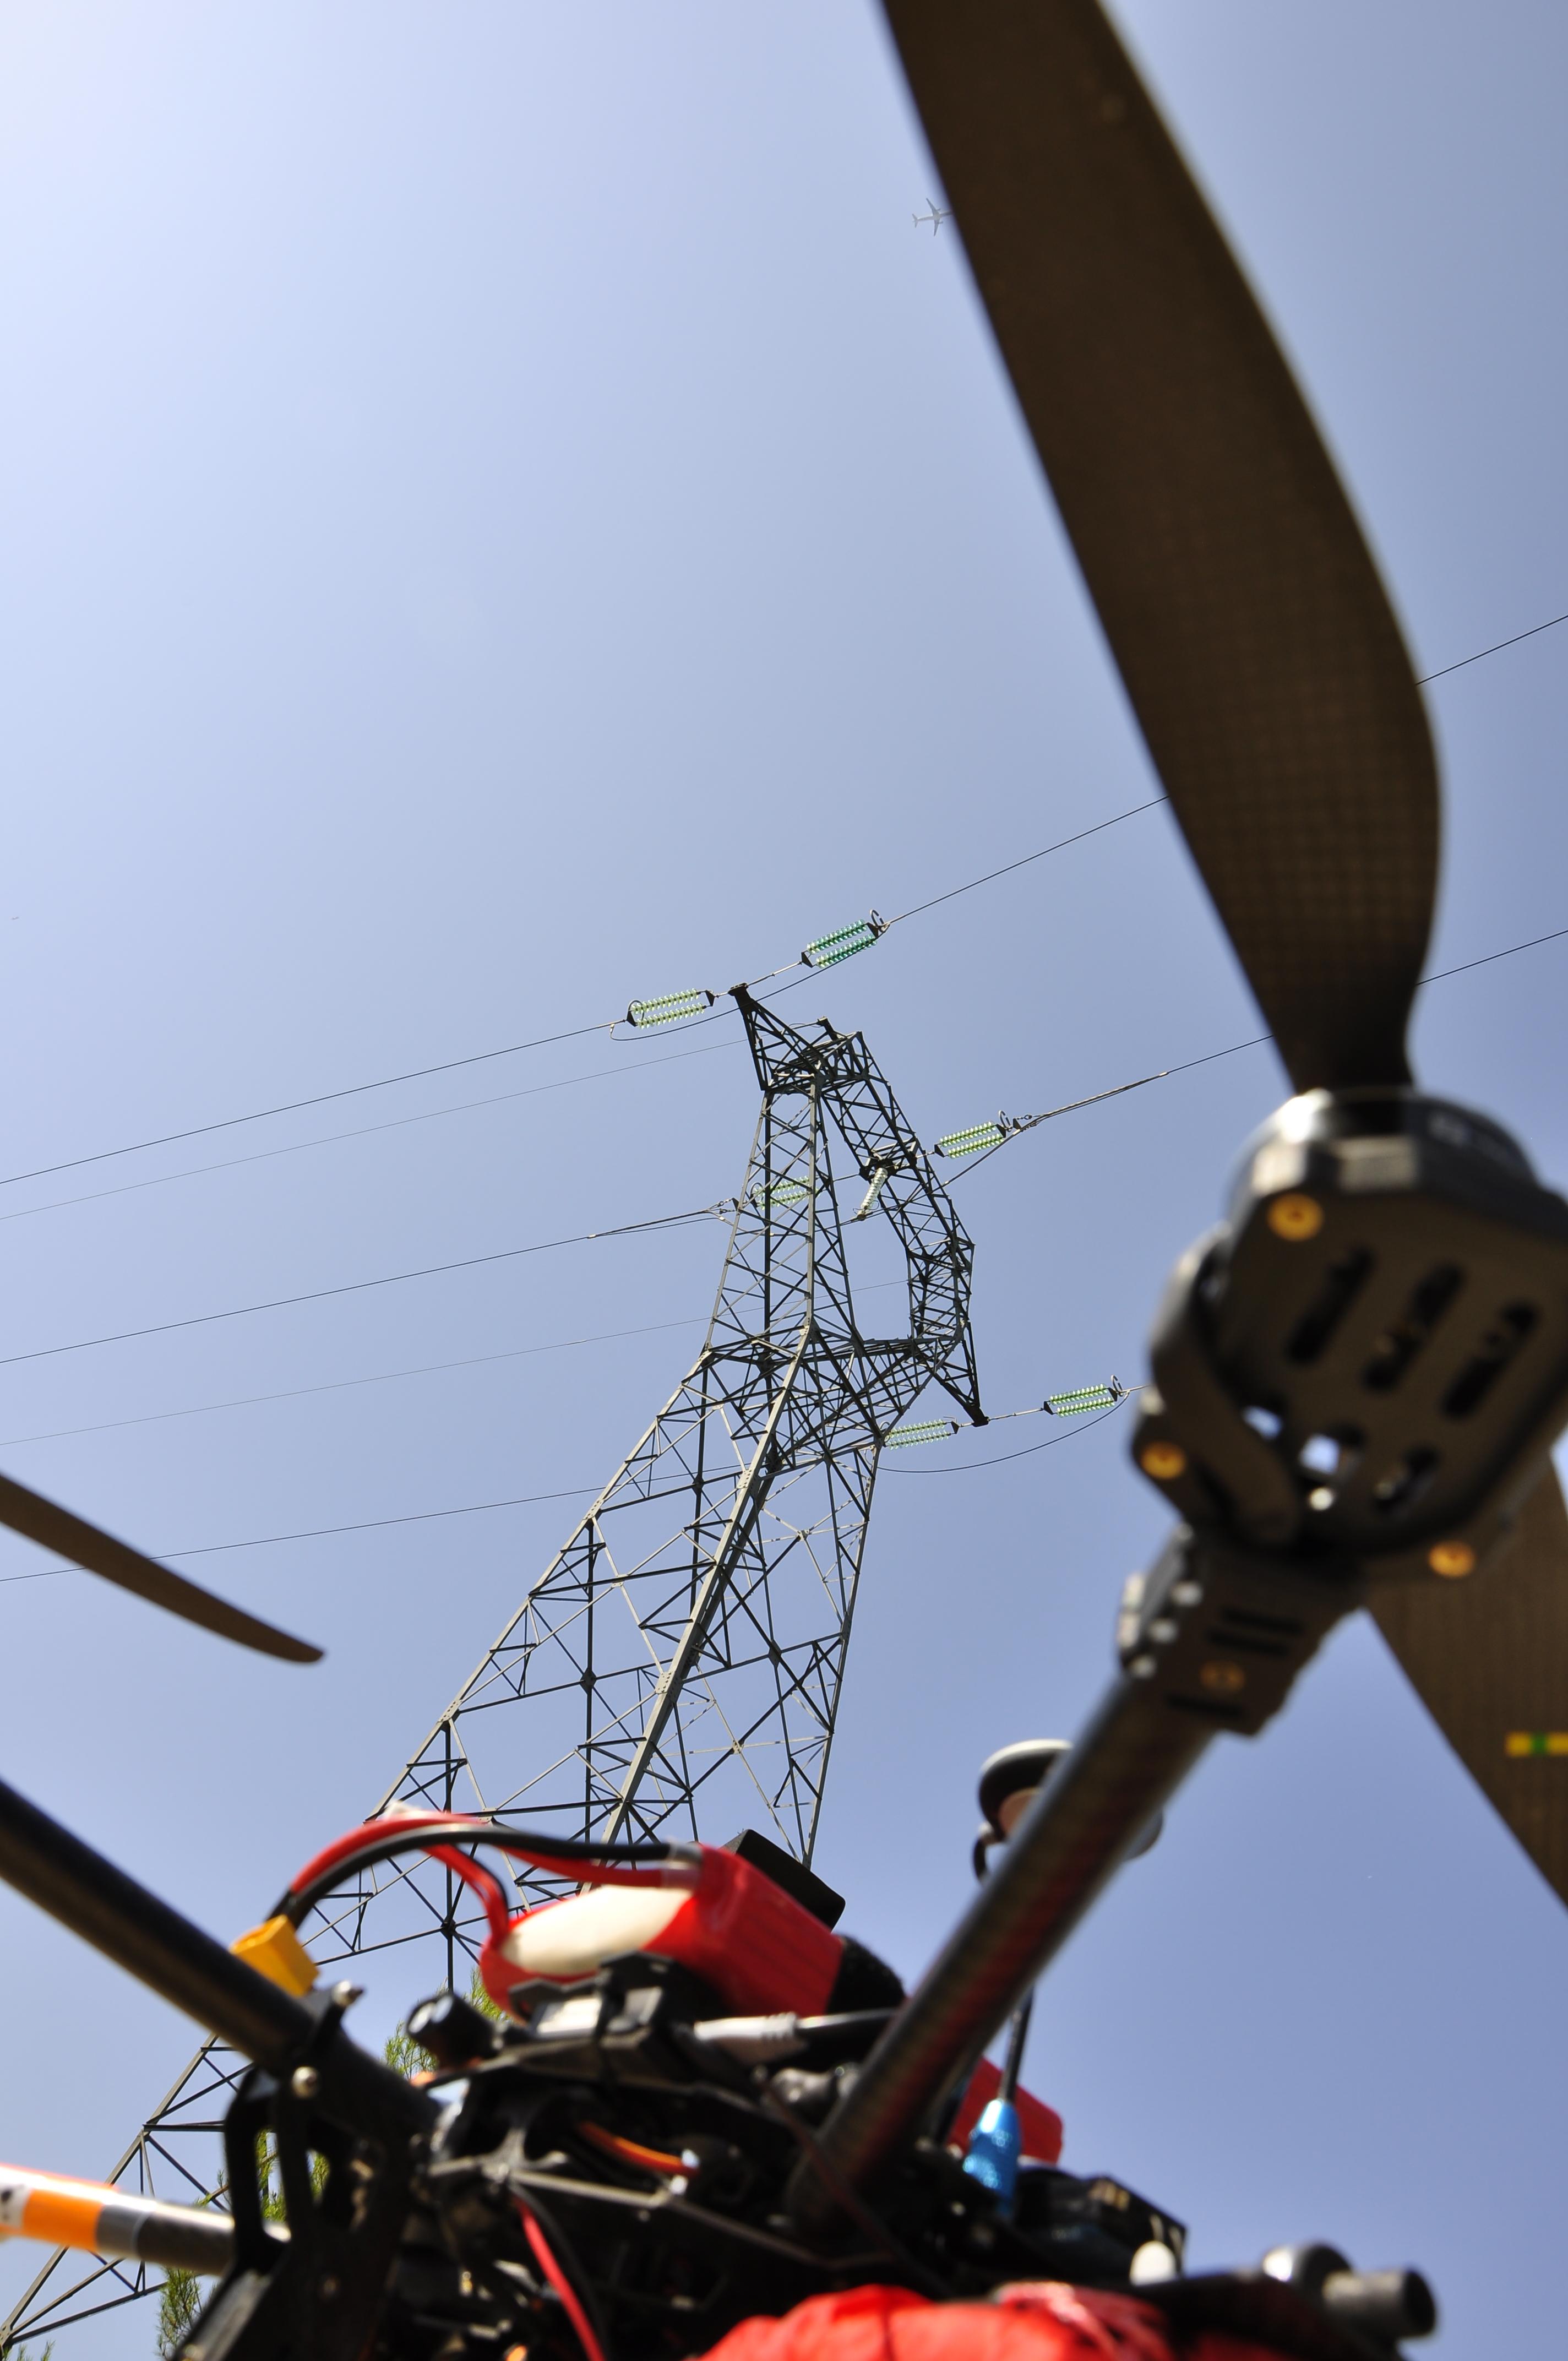 Drone et pylone